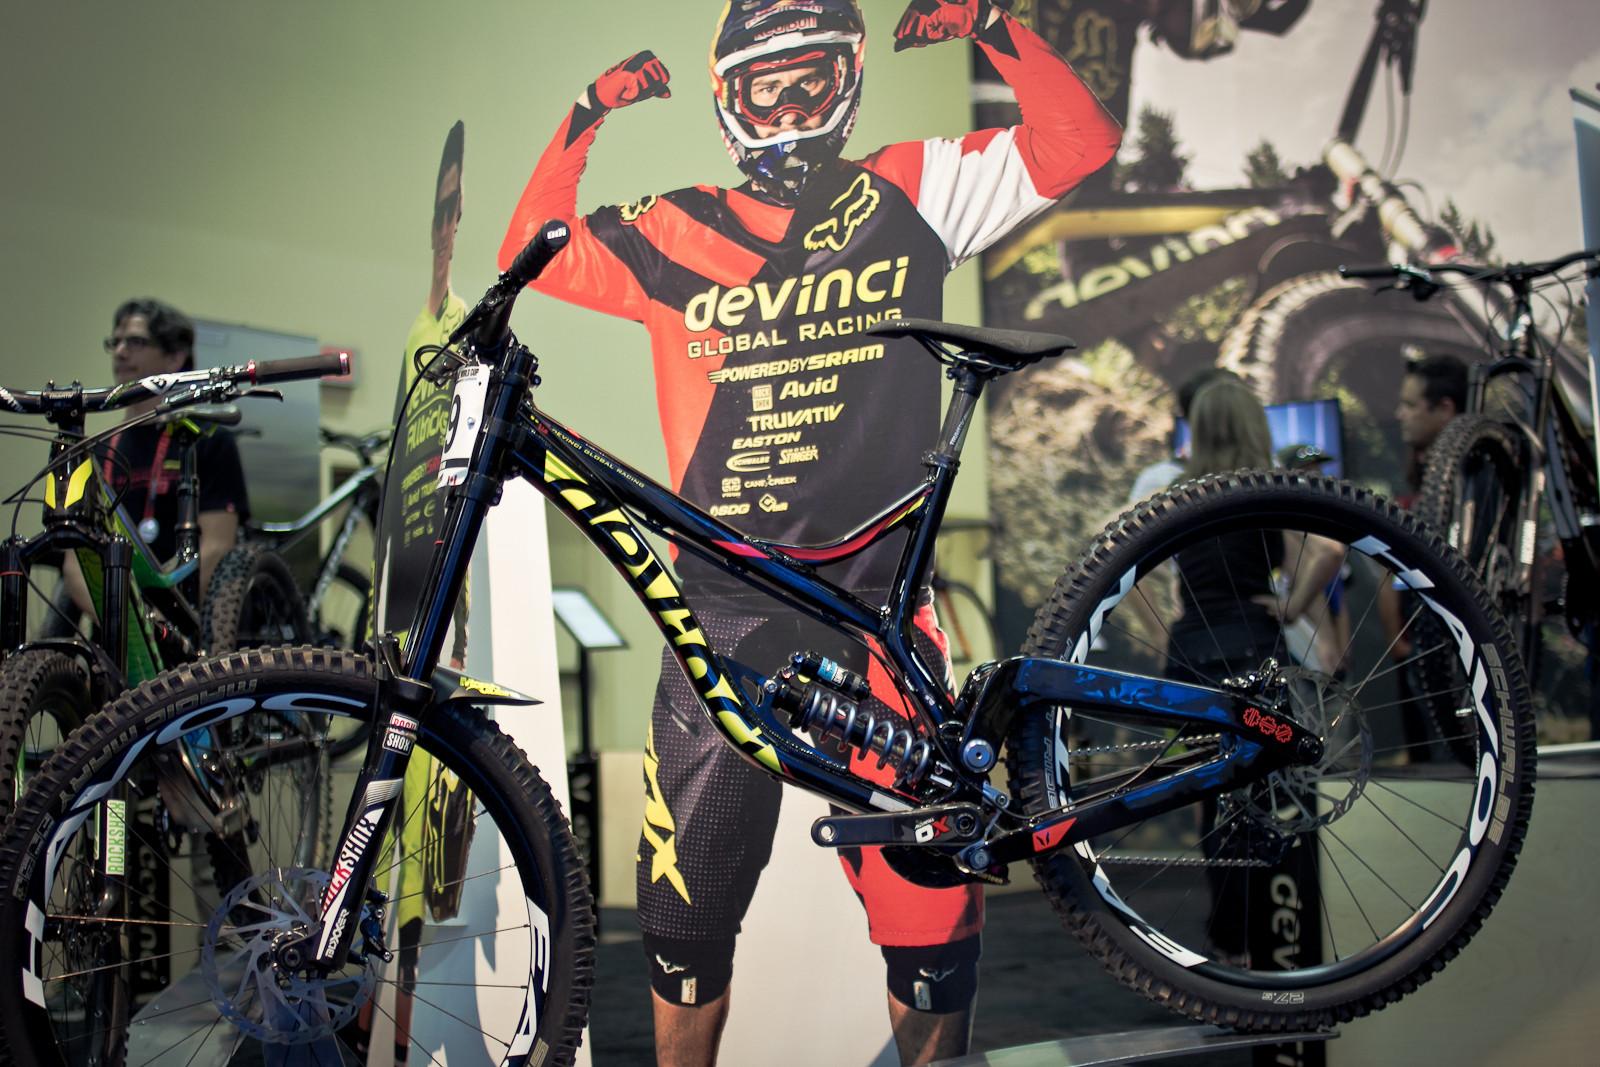 Pro Bike: Steve Smith's Devinci Wilson 27.5 - Pro Bike: Steve Smith's Devinci Wilson 27.5 - Mountain Biking Pictures - Vital MTB